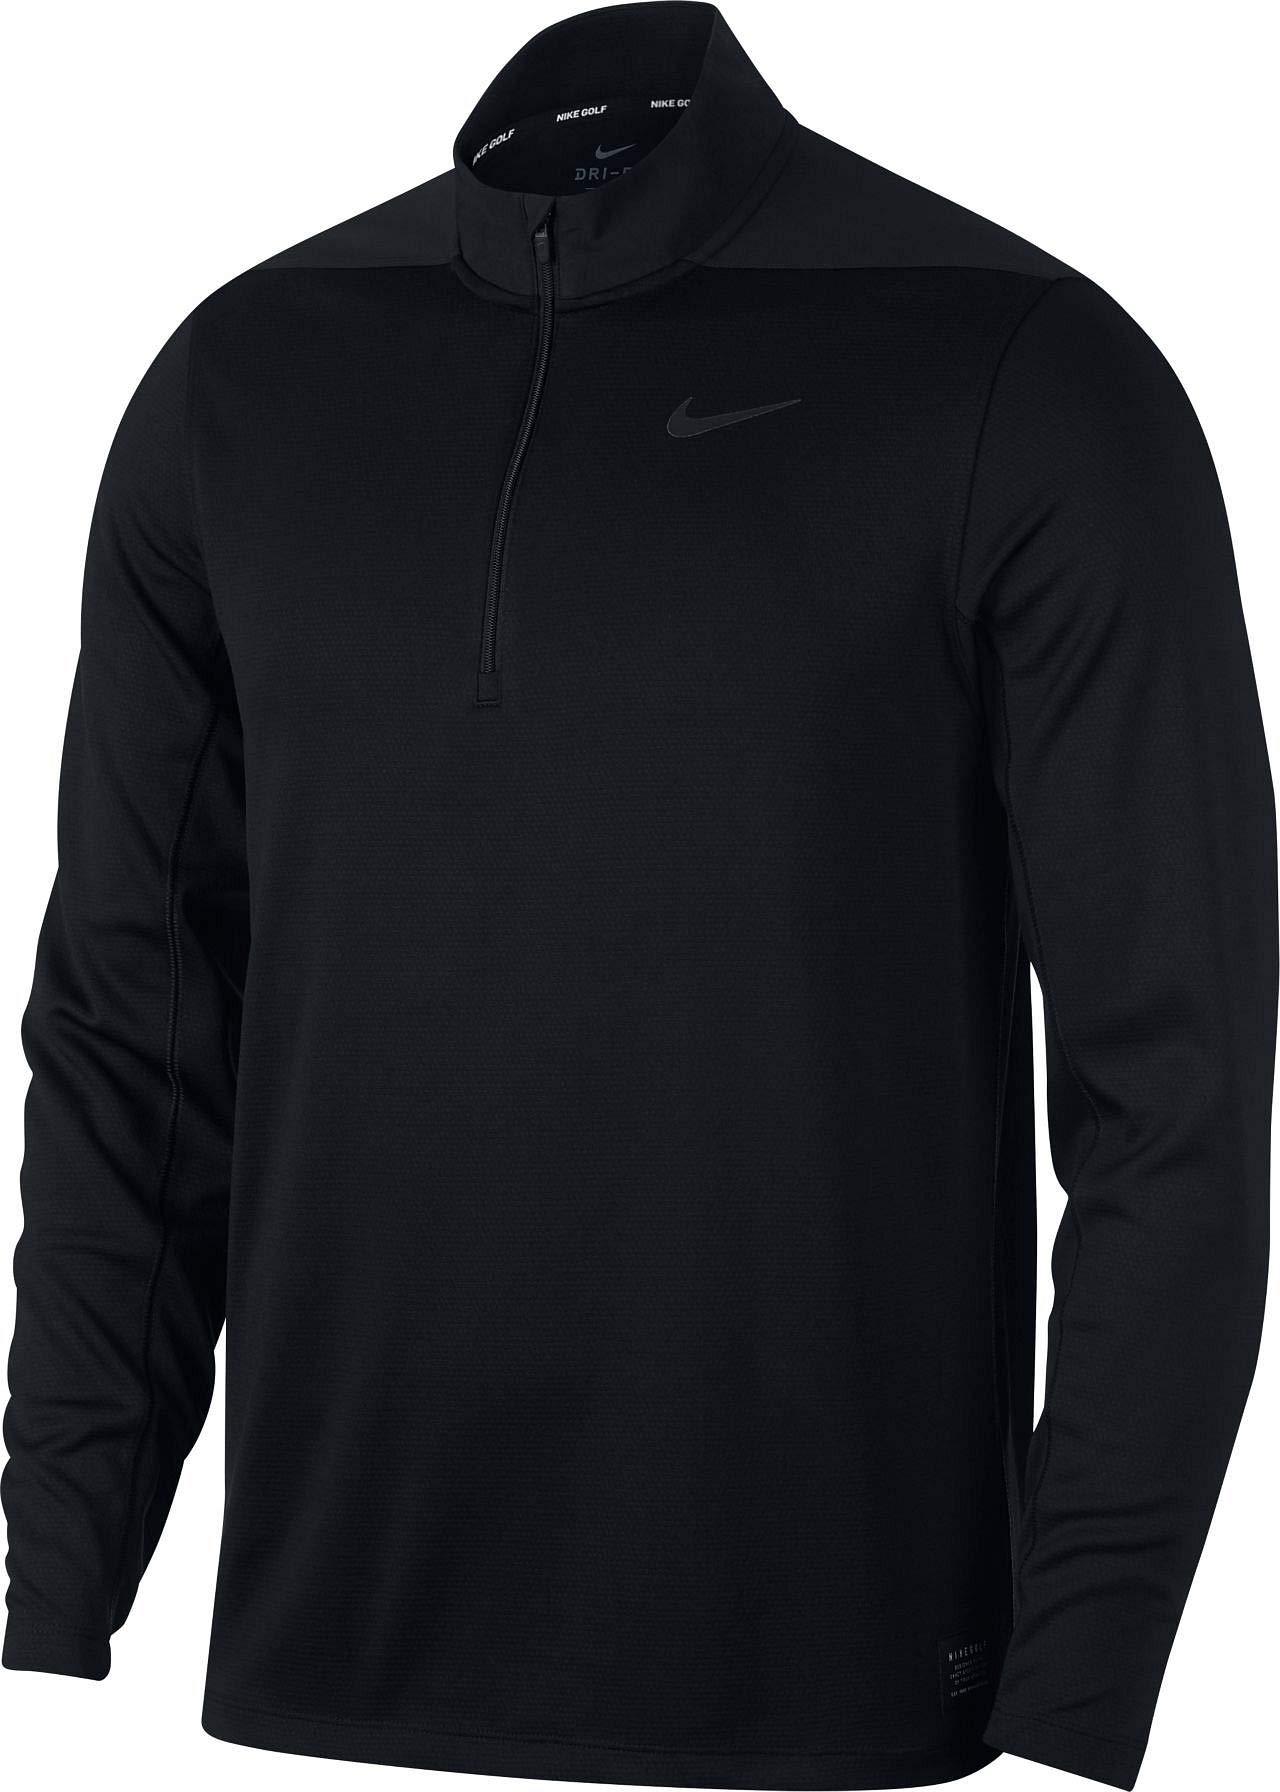 Nike Men's Dry Top Half Zip core, Black/Black/Black/Black, Small by Nike (Image #1)